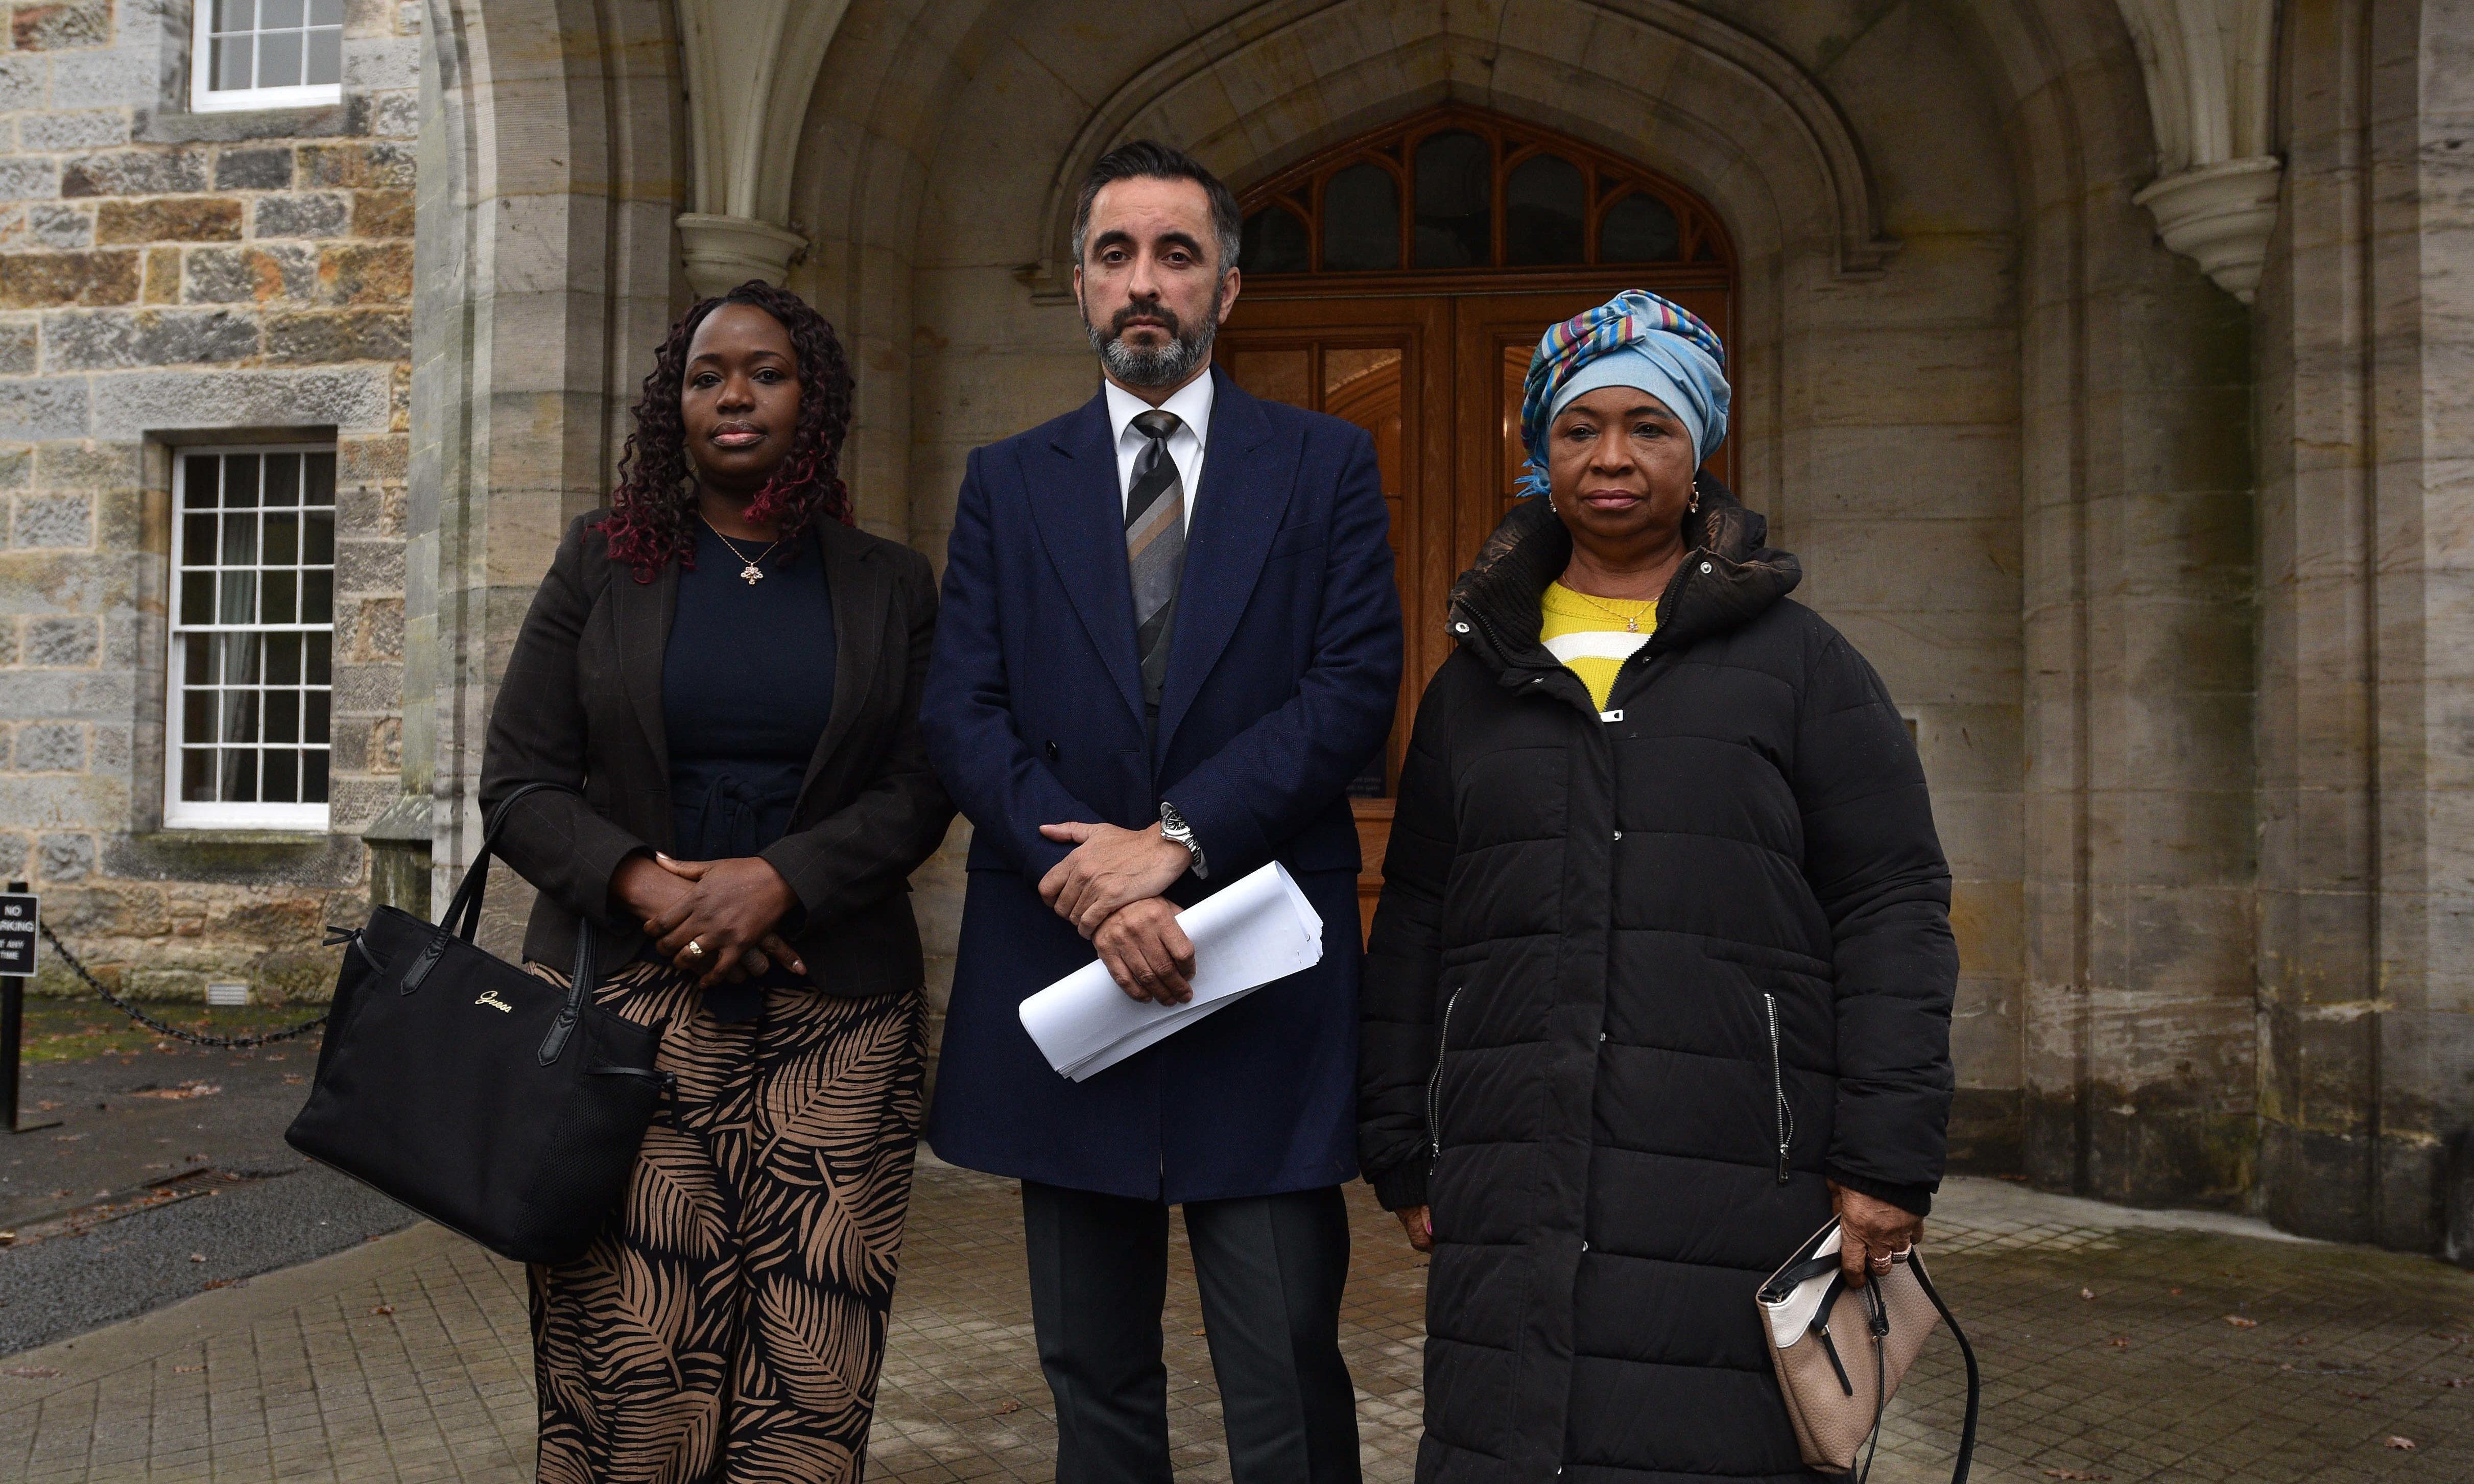 Mr Amwar with Kadi Johnston, left, and Aminata Bayoh.